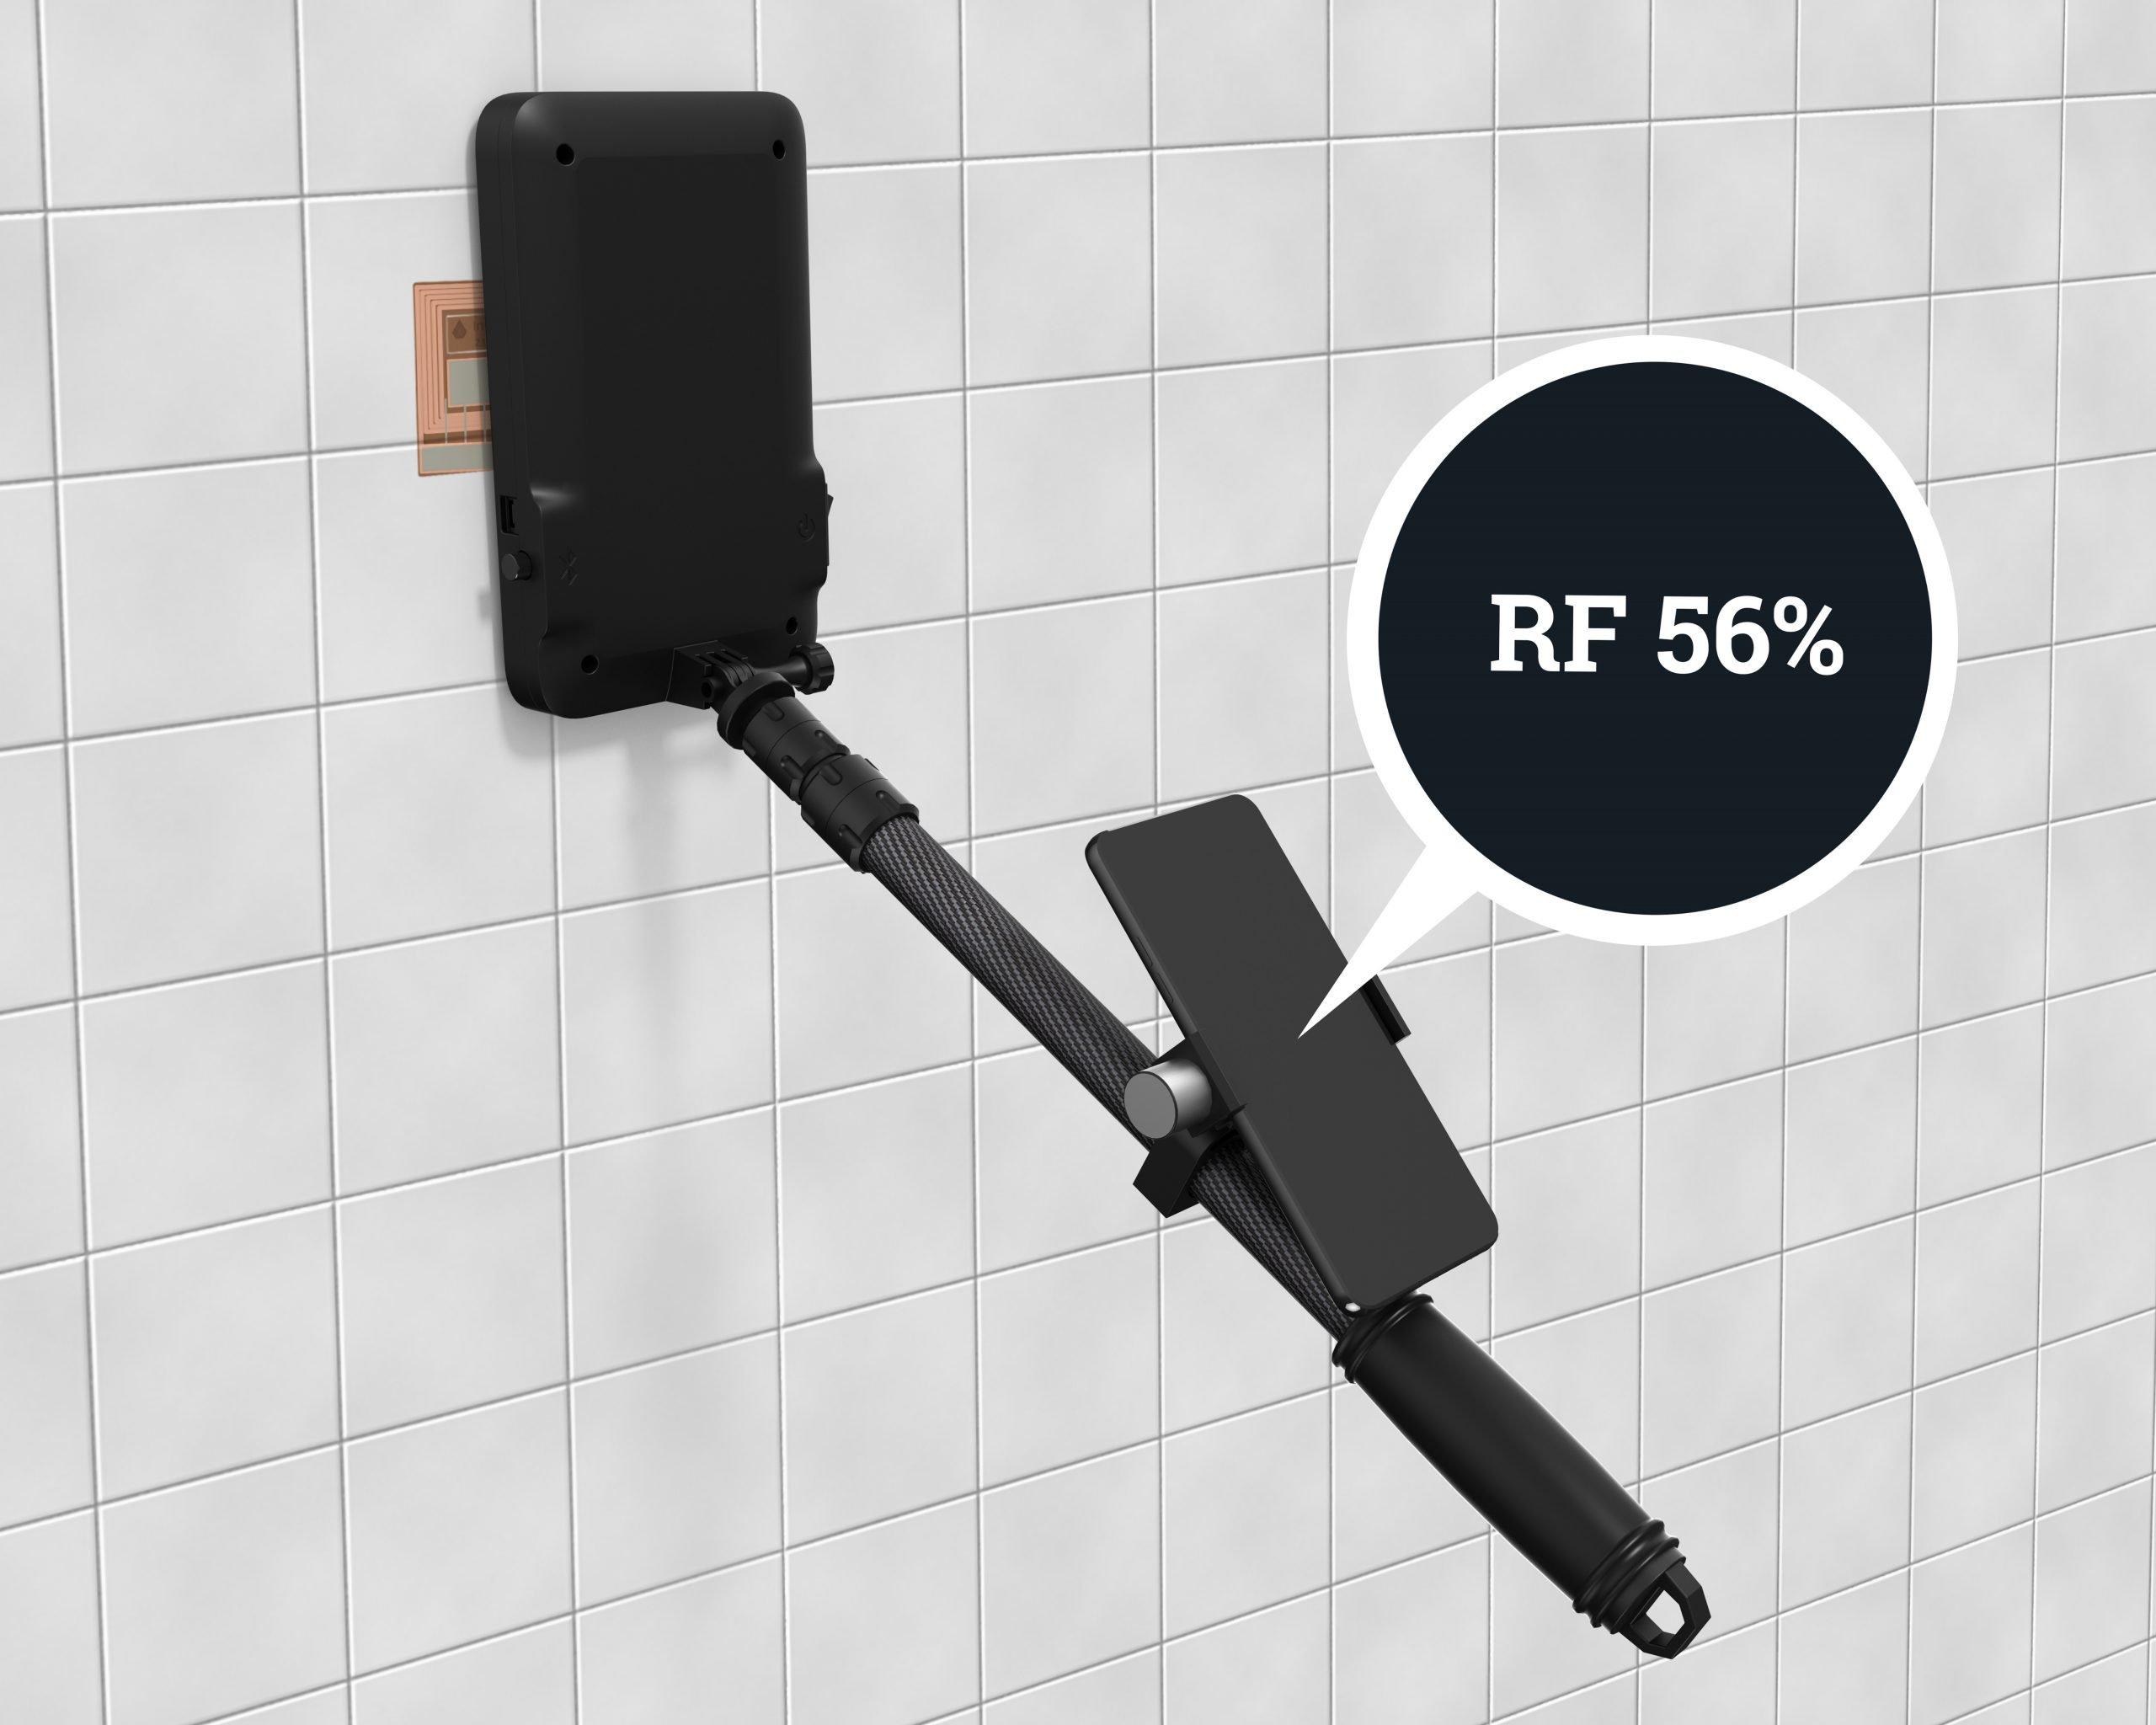 Passive moisture sensor build into wall, floors and roofs